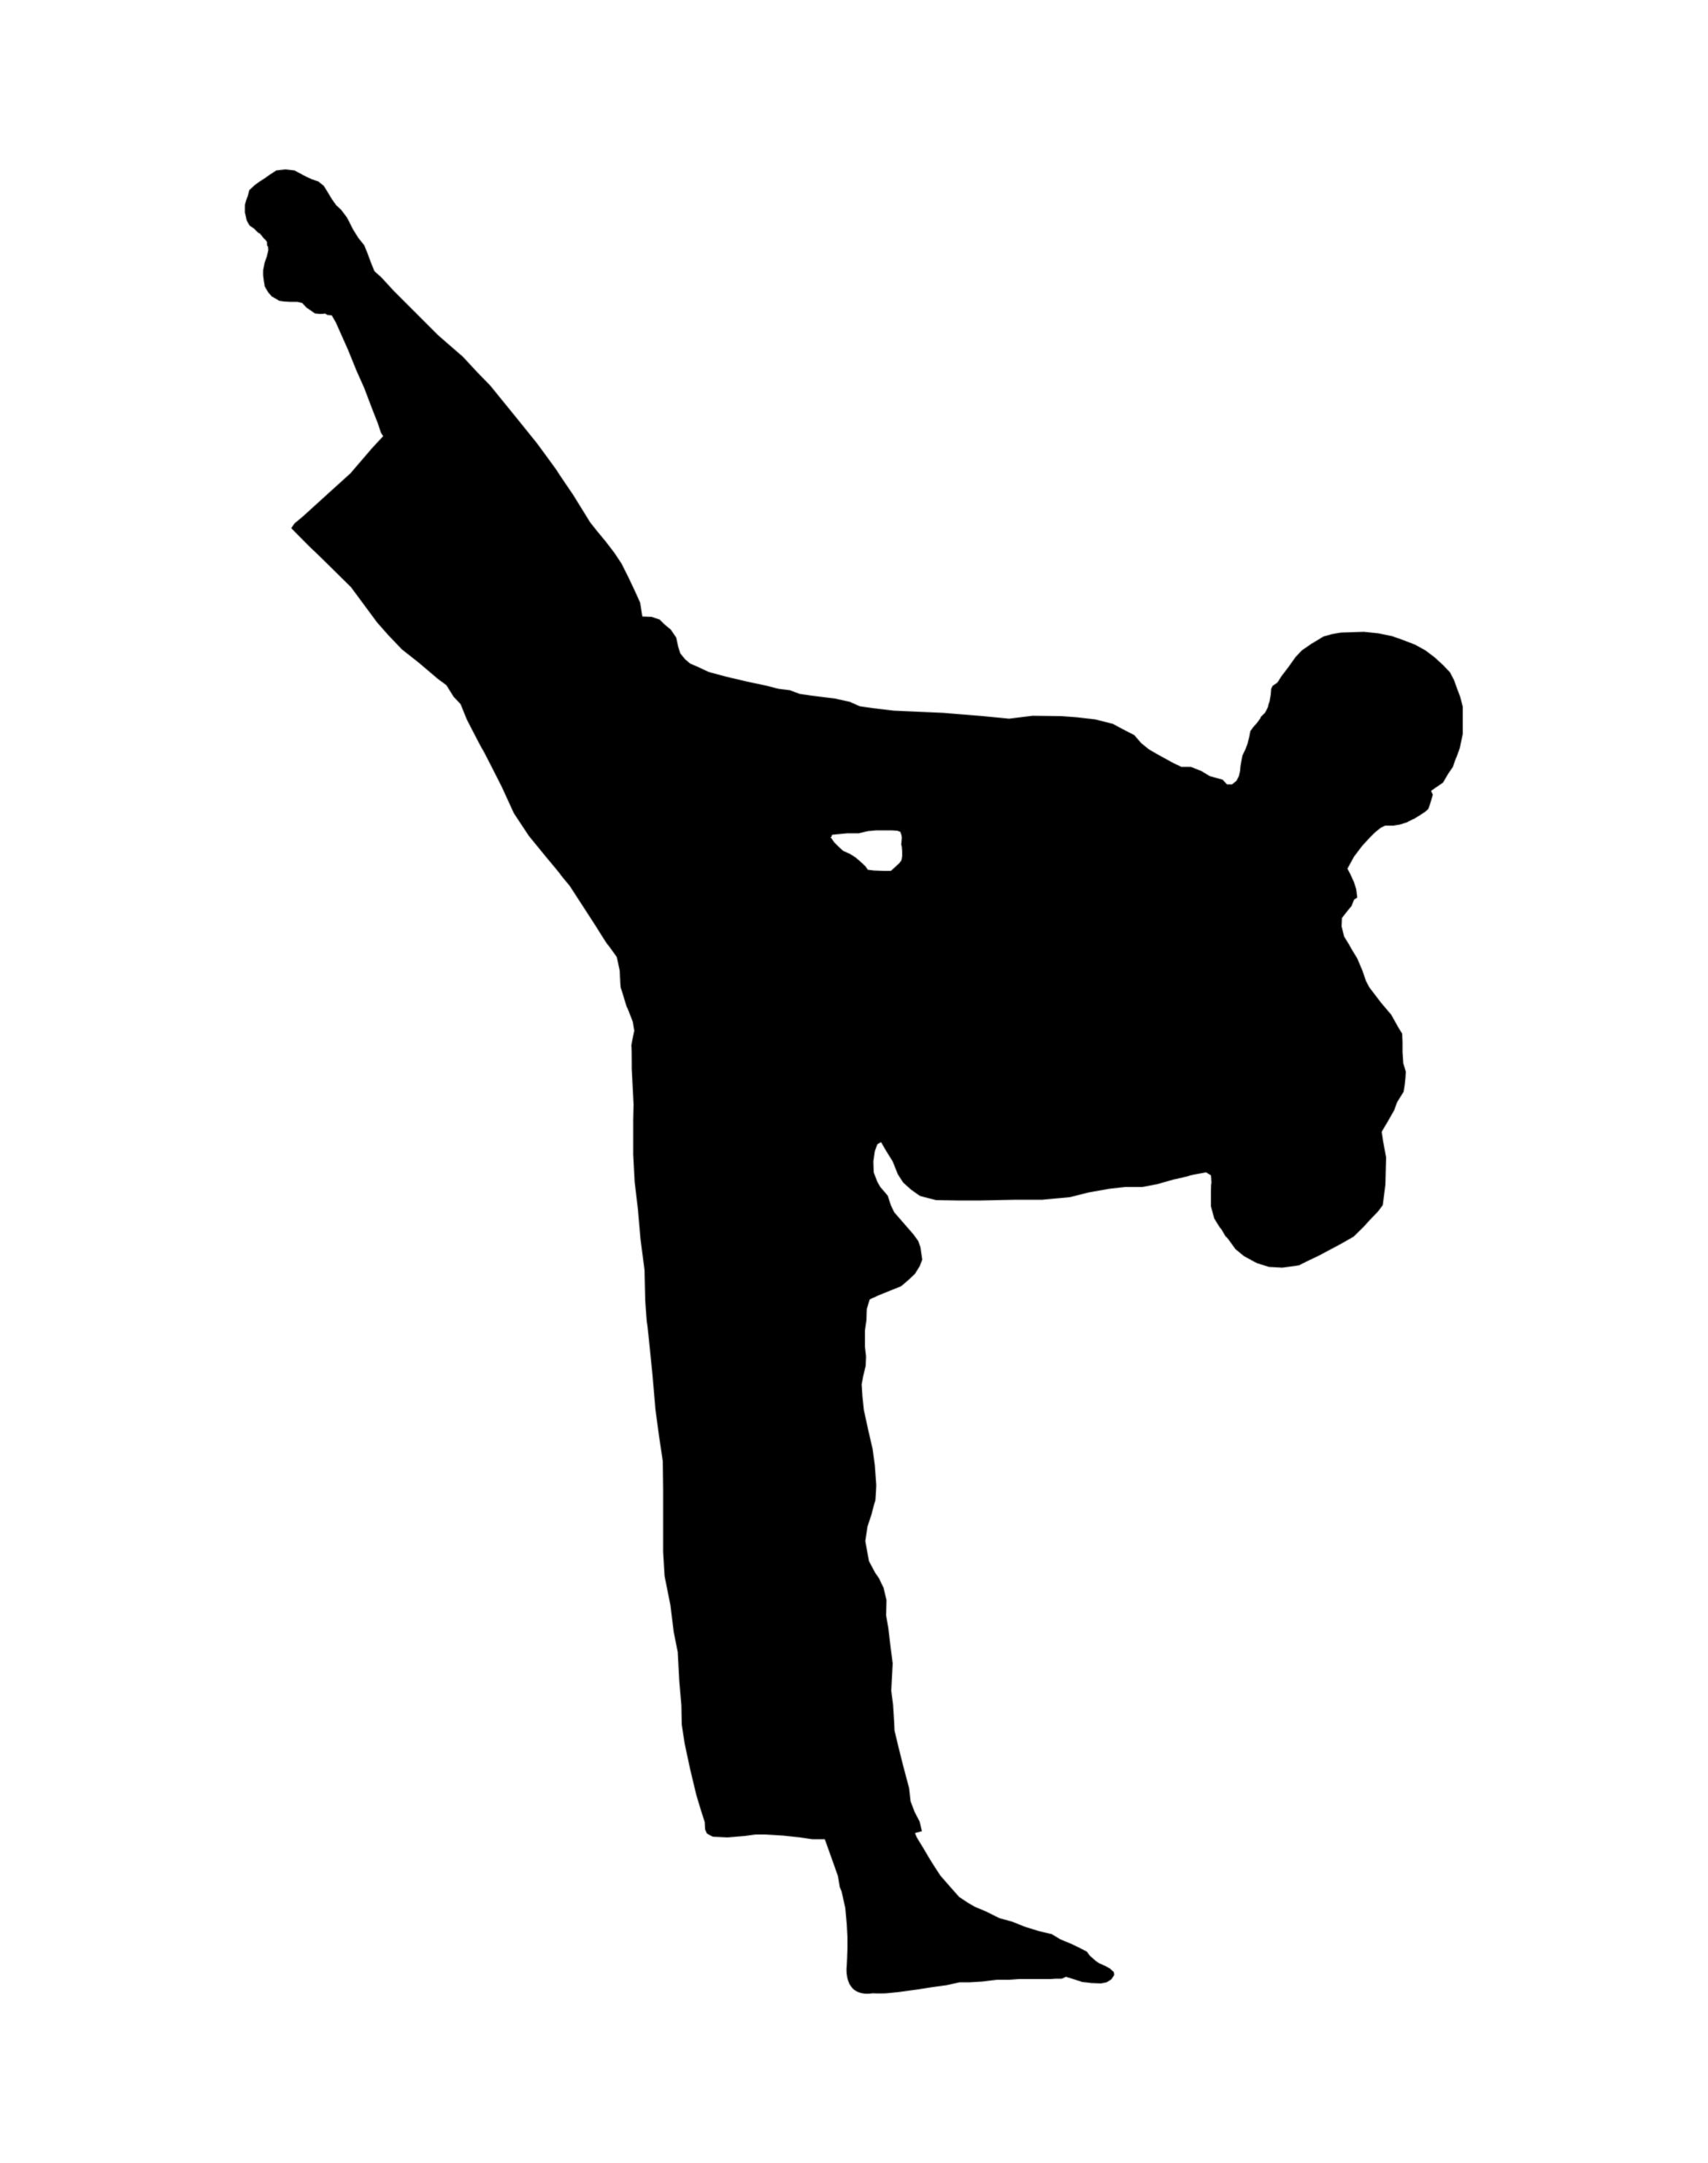 Martial Art Clip Art - Clipart library